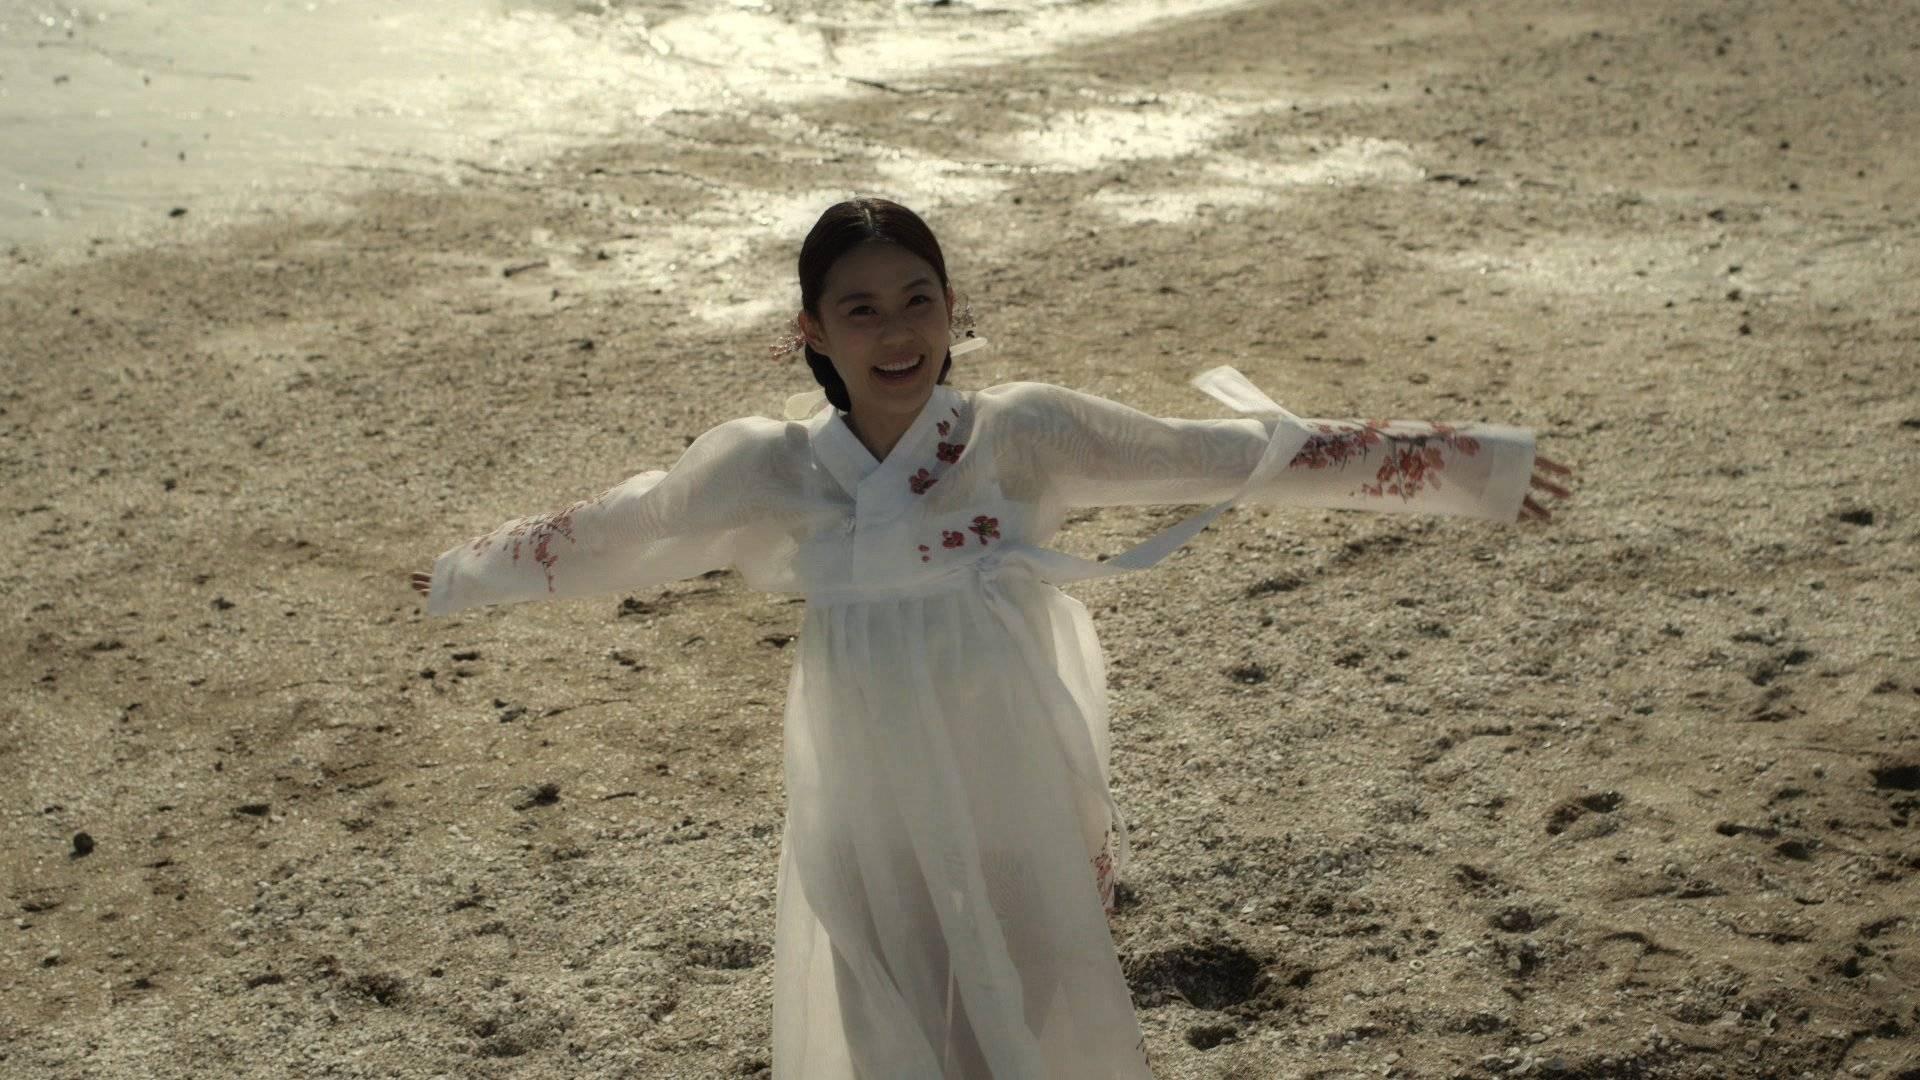 171 Prev The Groin 배꼽과 무릎사이 Korean Movie Next 187